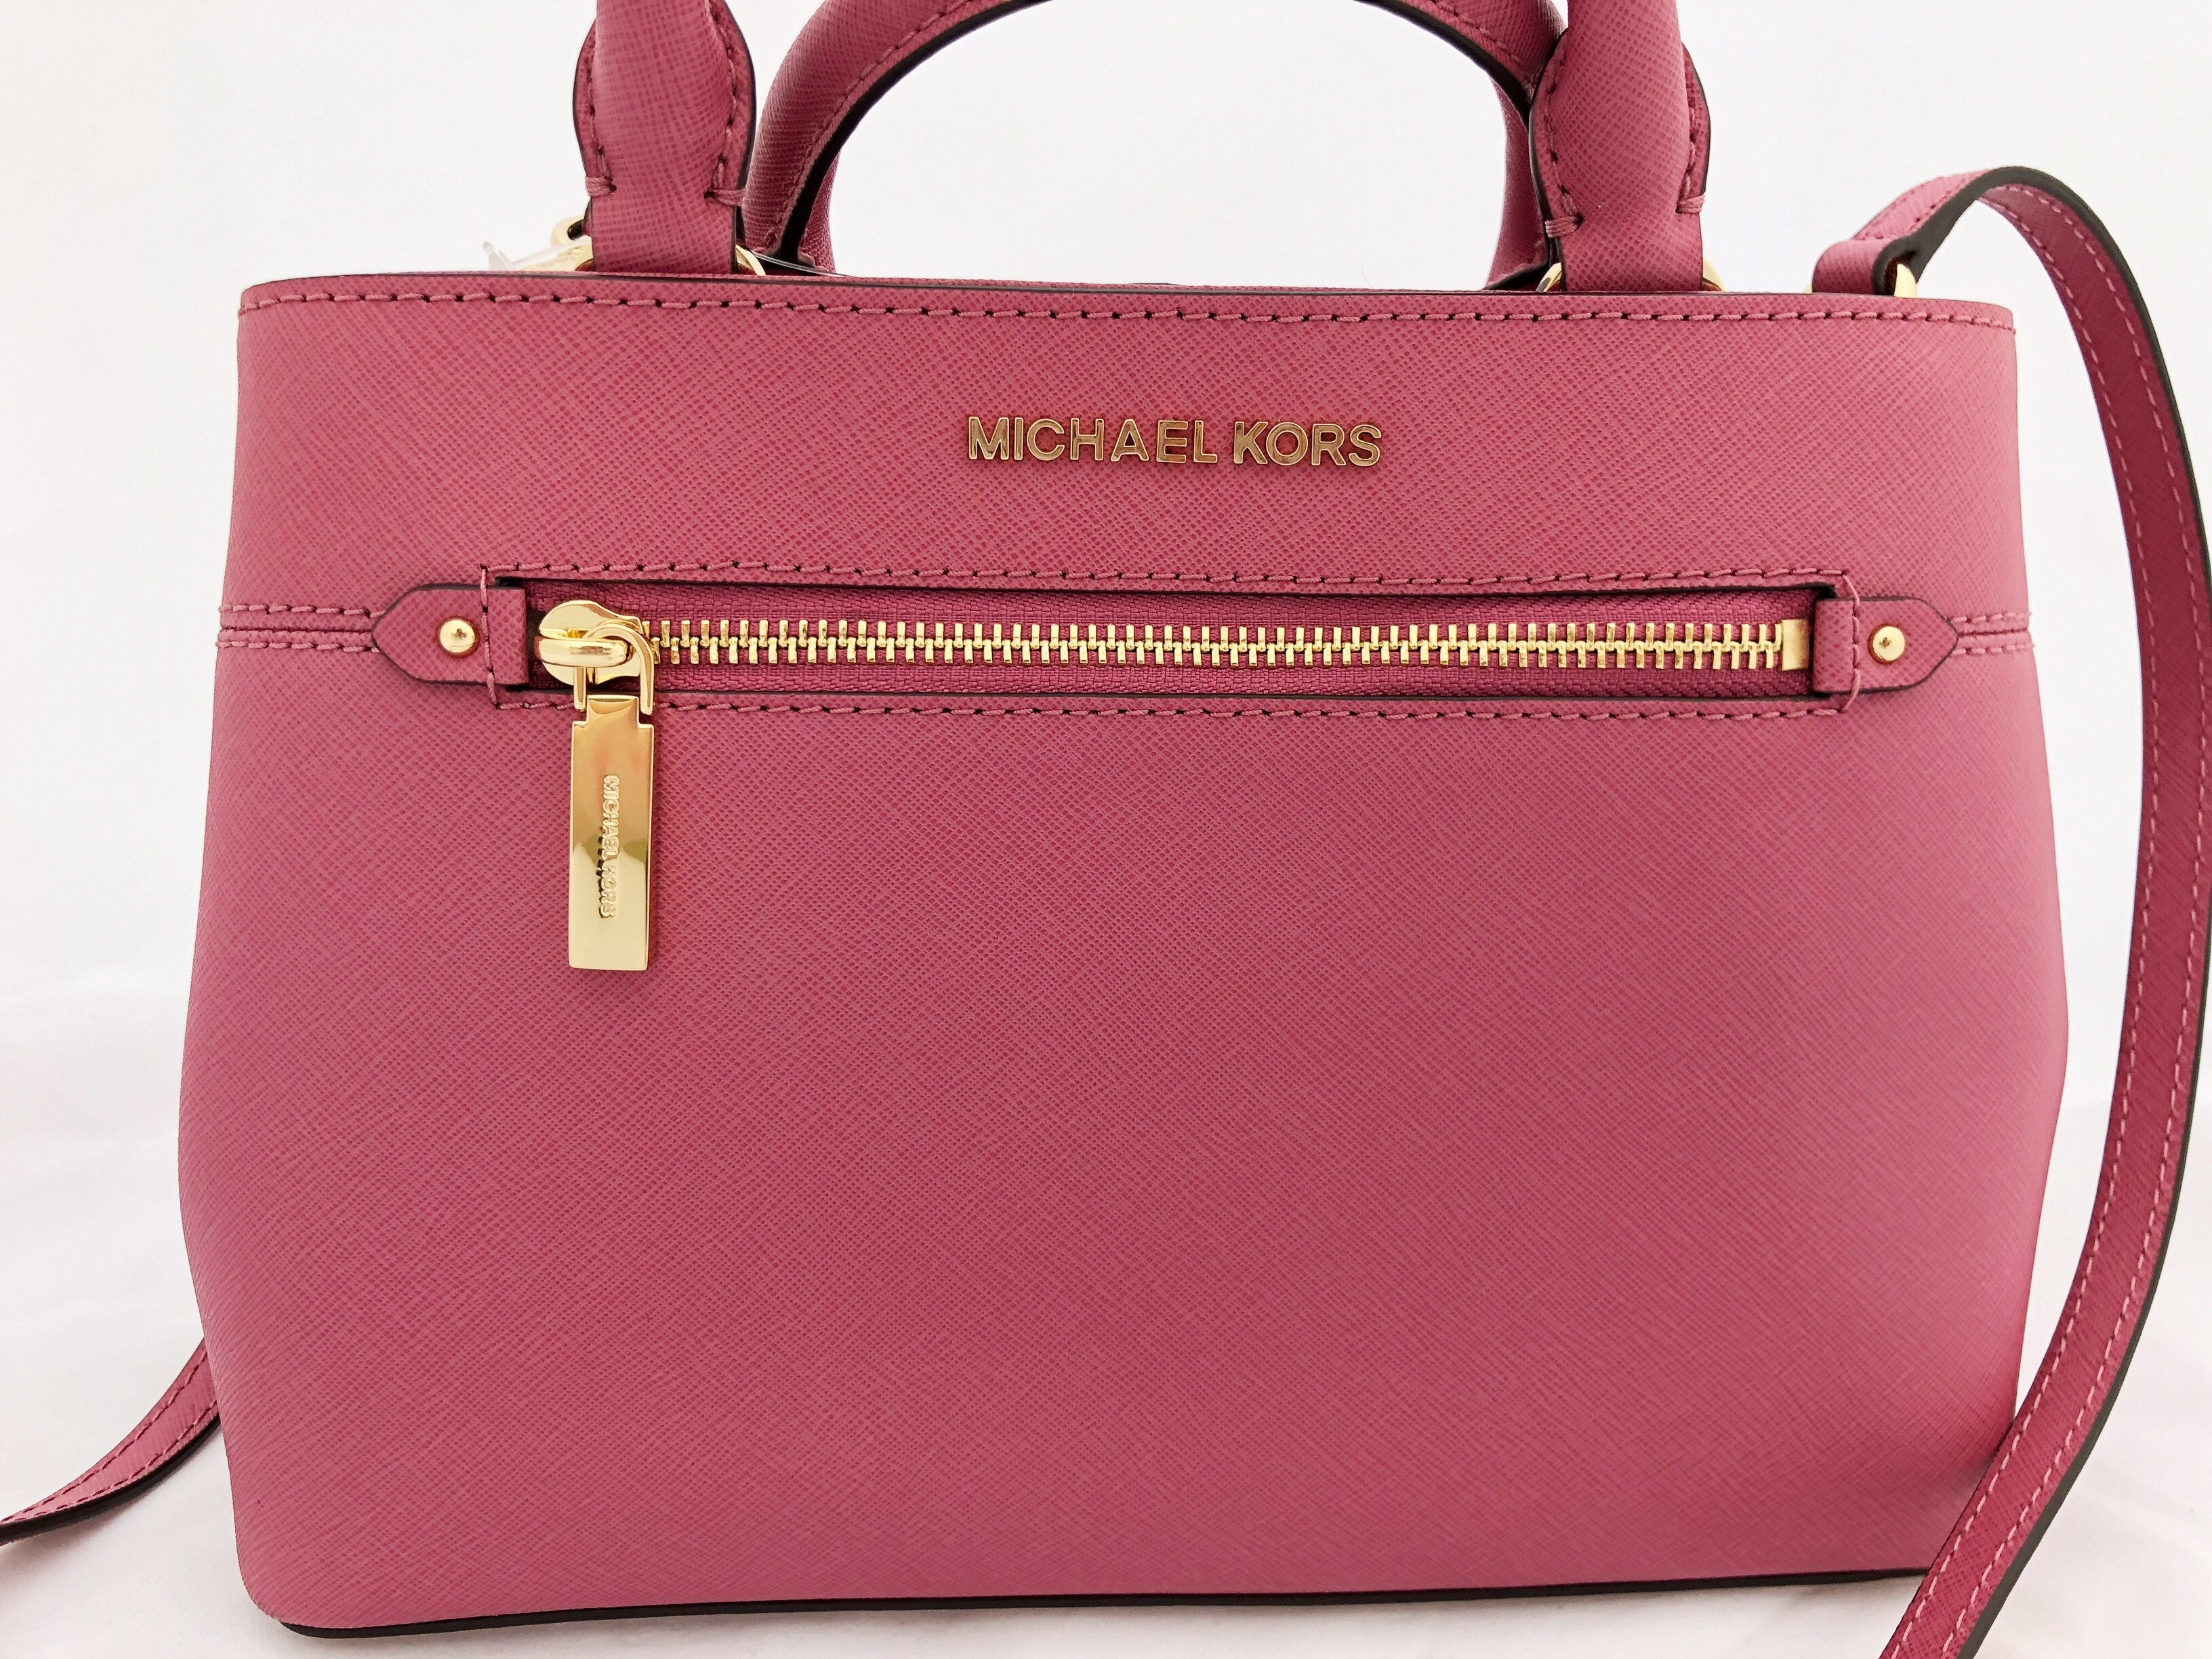 726ae6013b1f Michael Kors Hailee XS Satchel Small Crossbody Tulip Pink MISSING ...